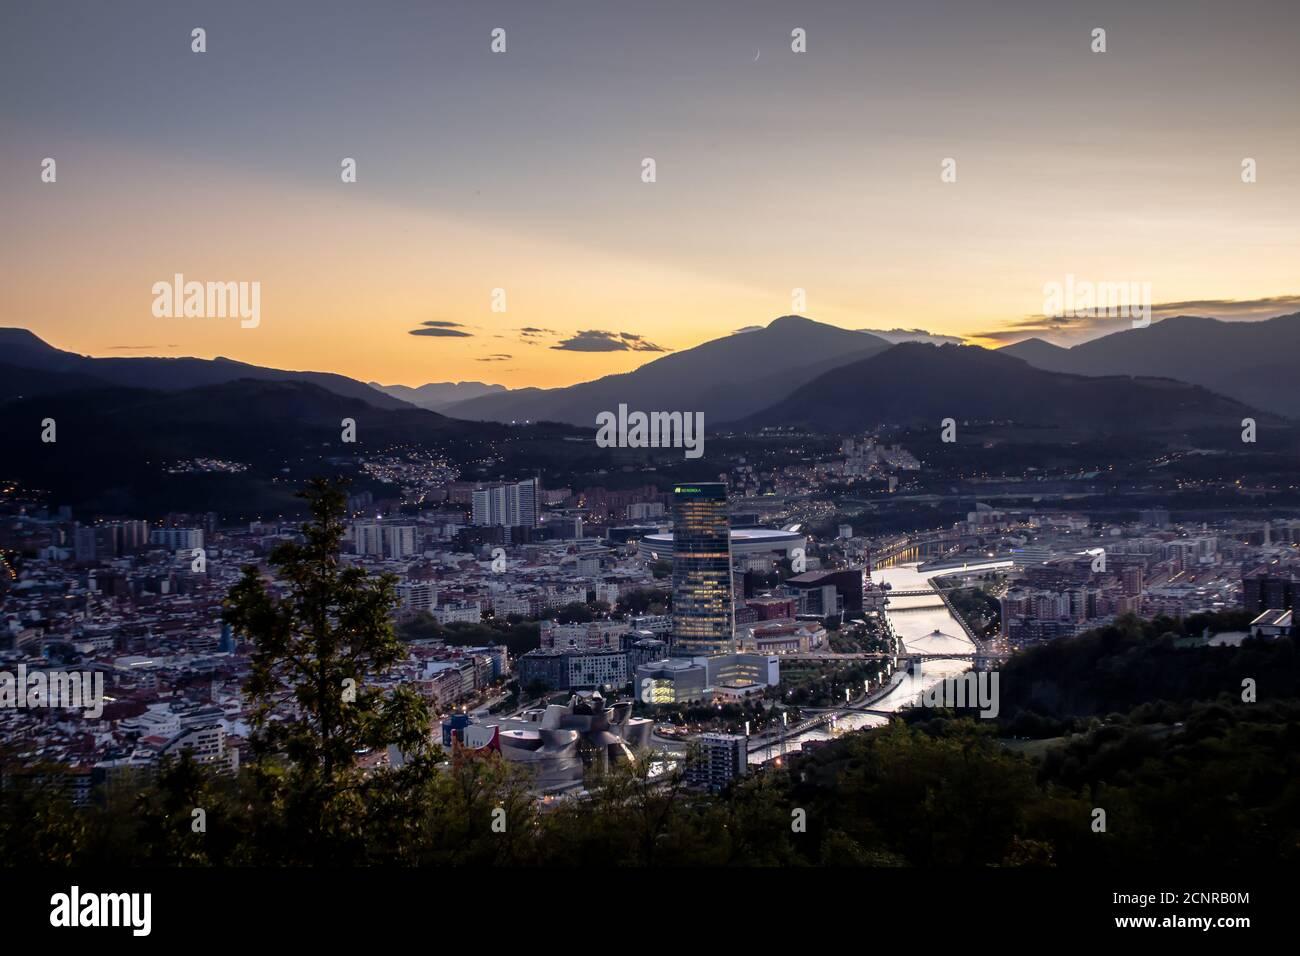 View of Bilbao in sunset. Stock Photo